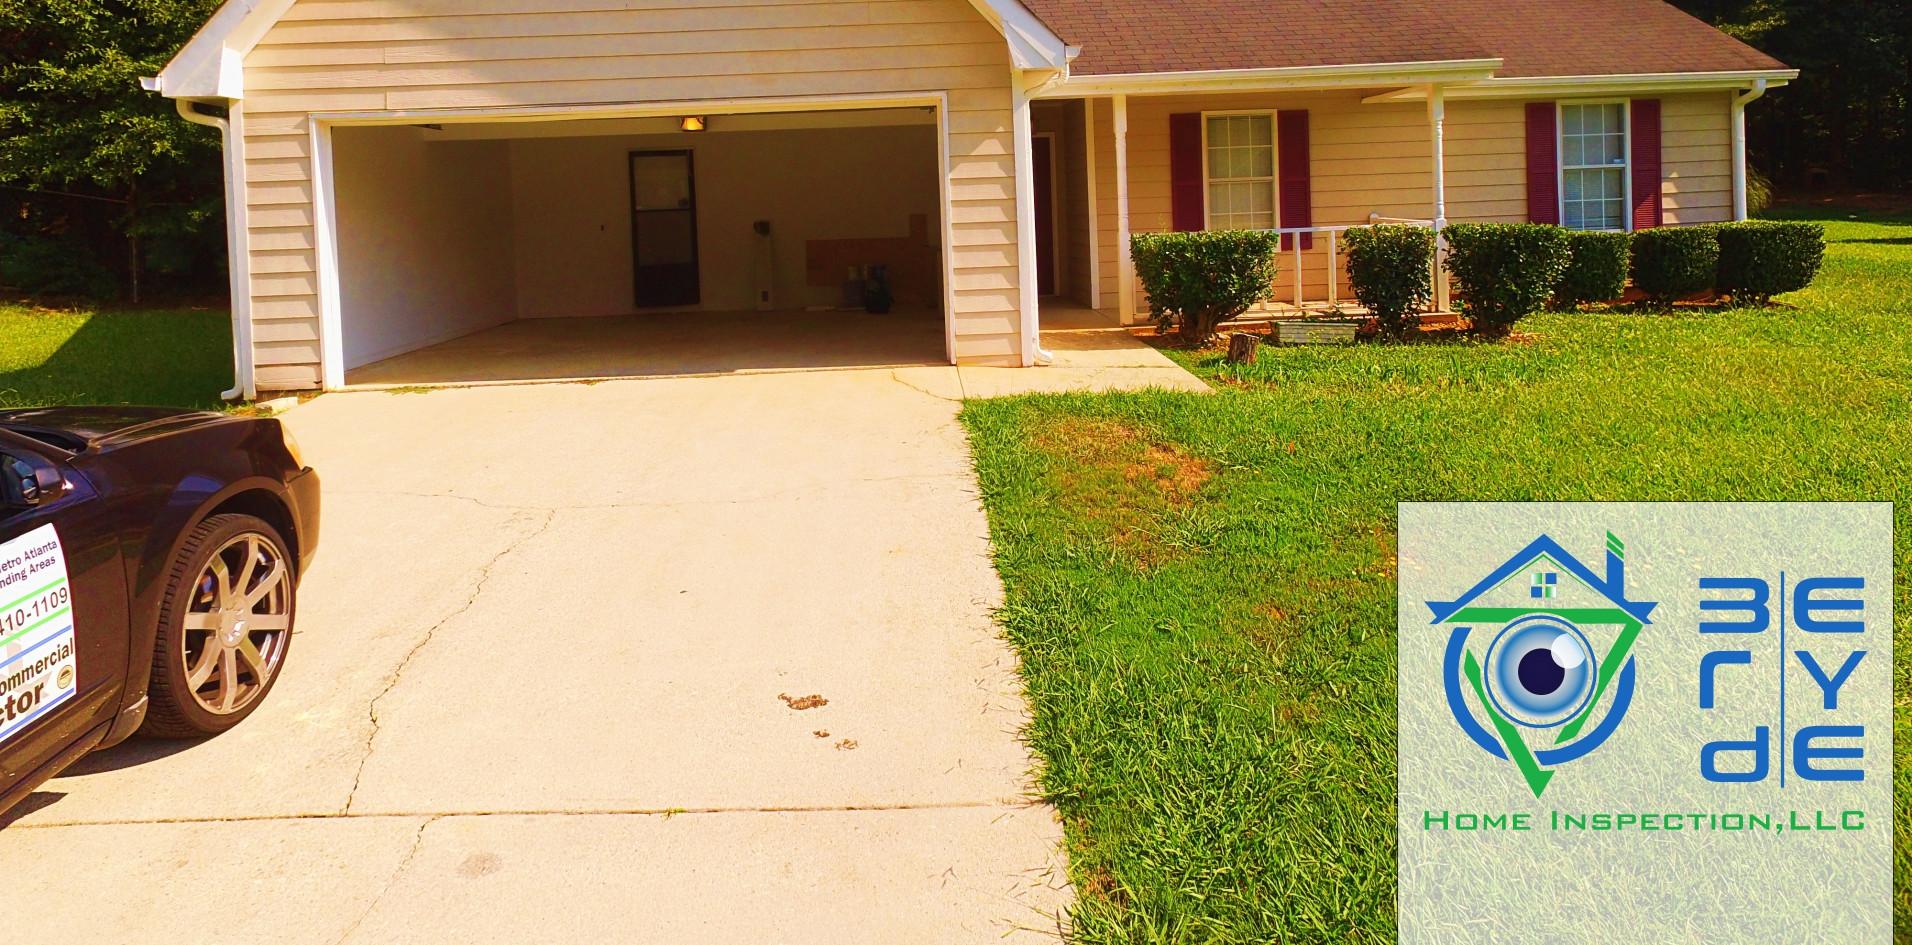 95 Oak Ridge Ct _ 3rd EYE Home Inspectio